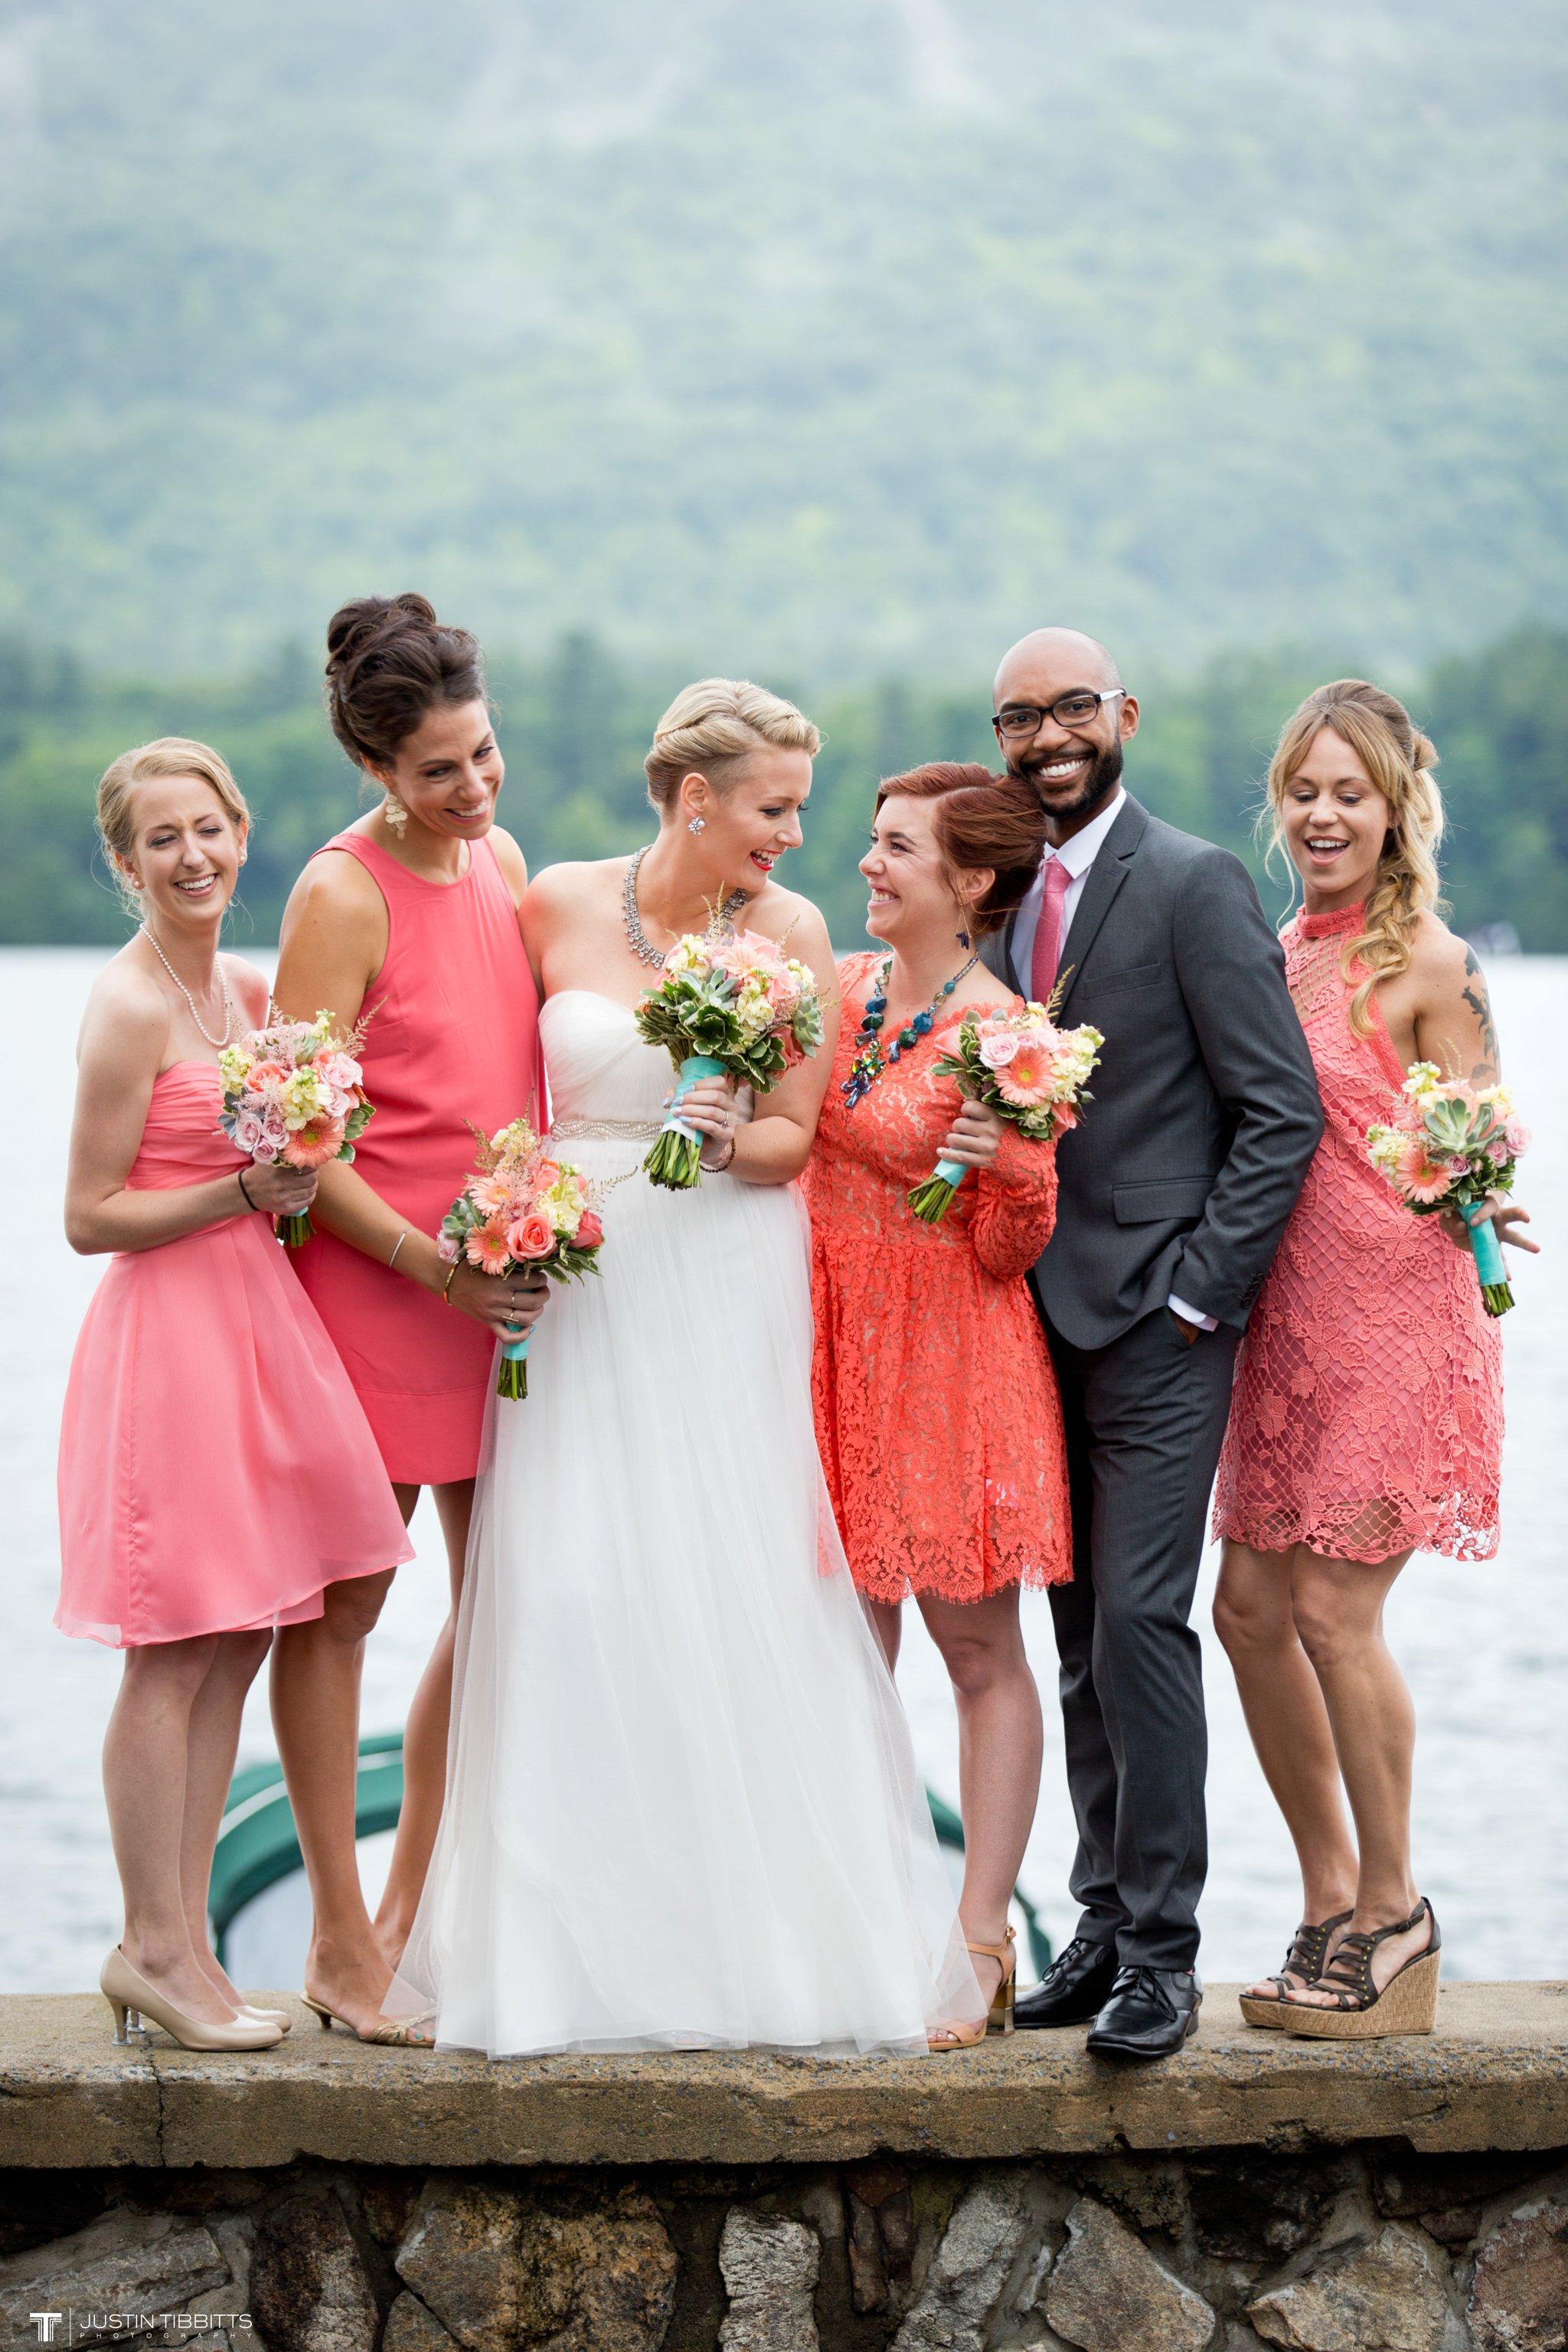 burlap-and-beams-wedding-photos-with-joran-and-molly_0035